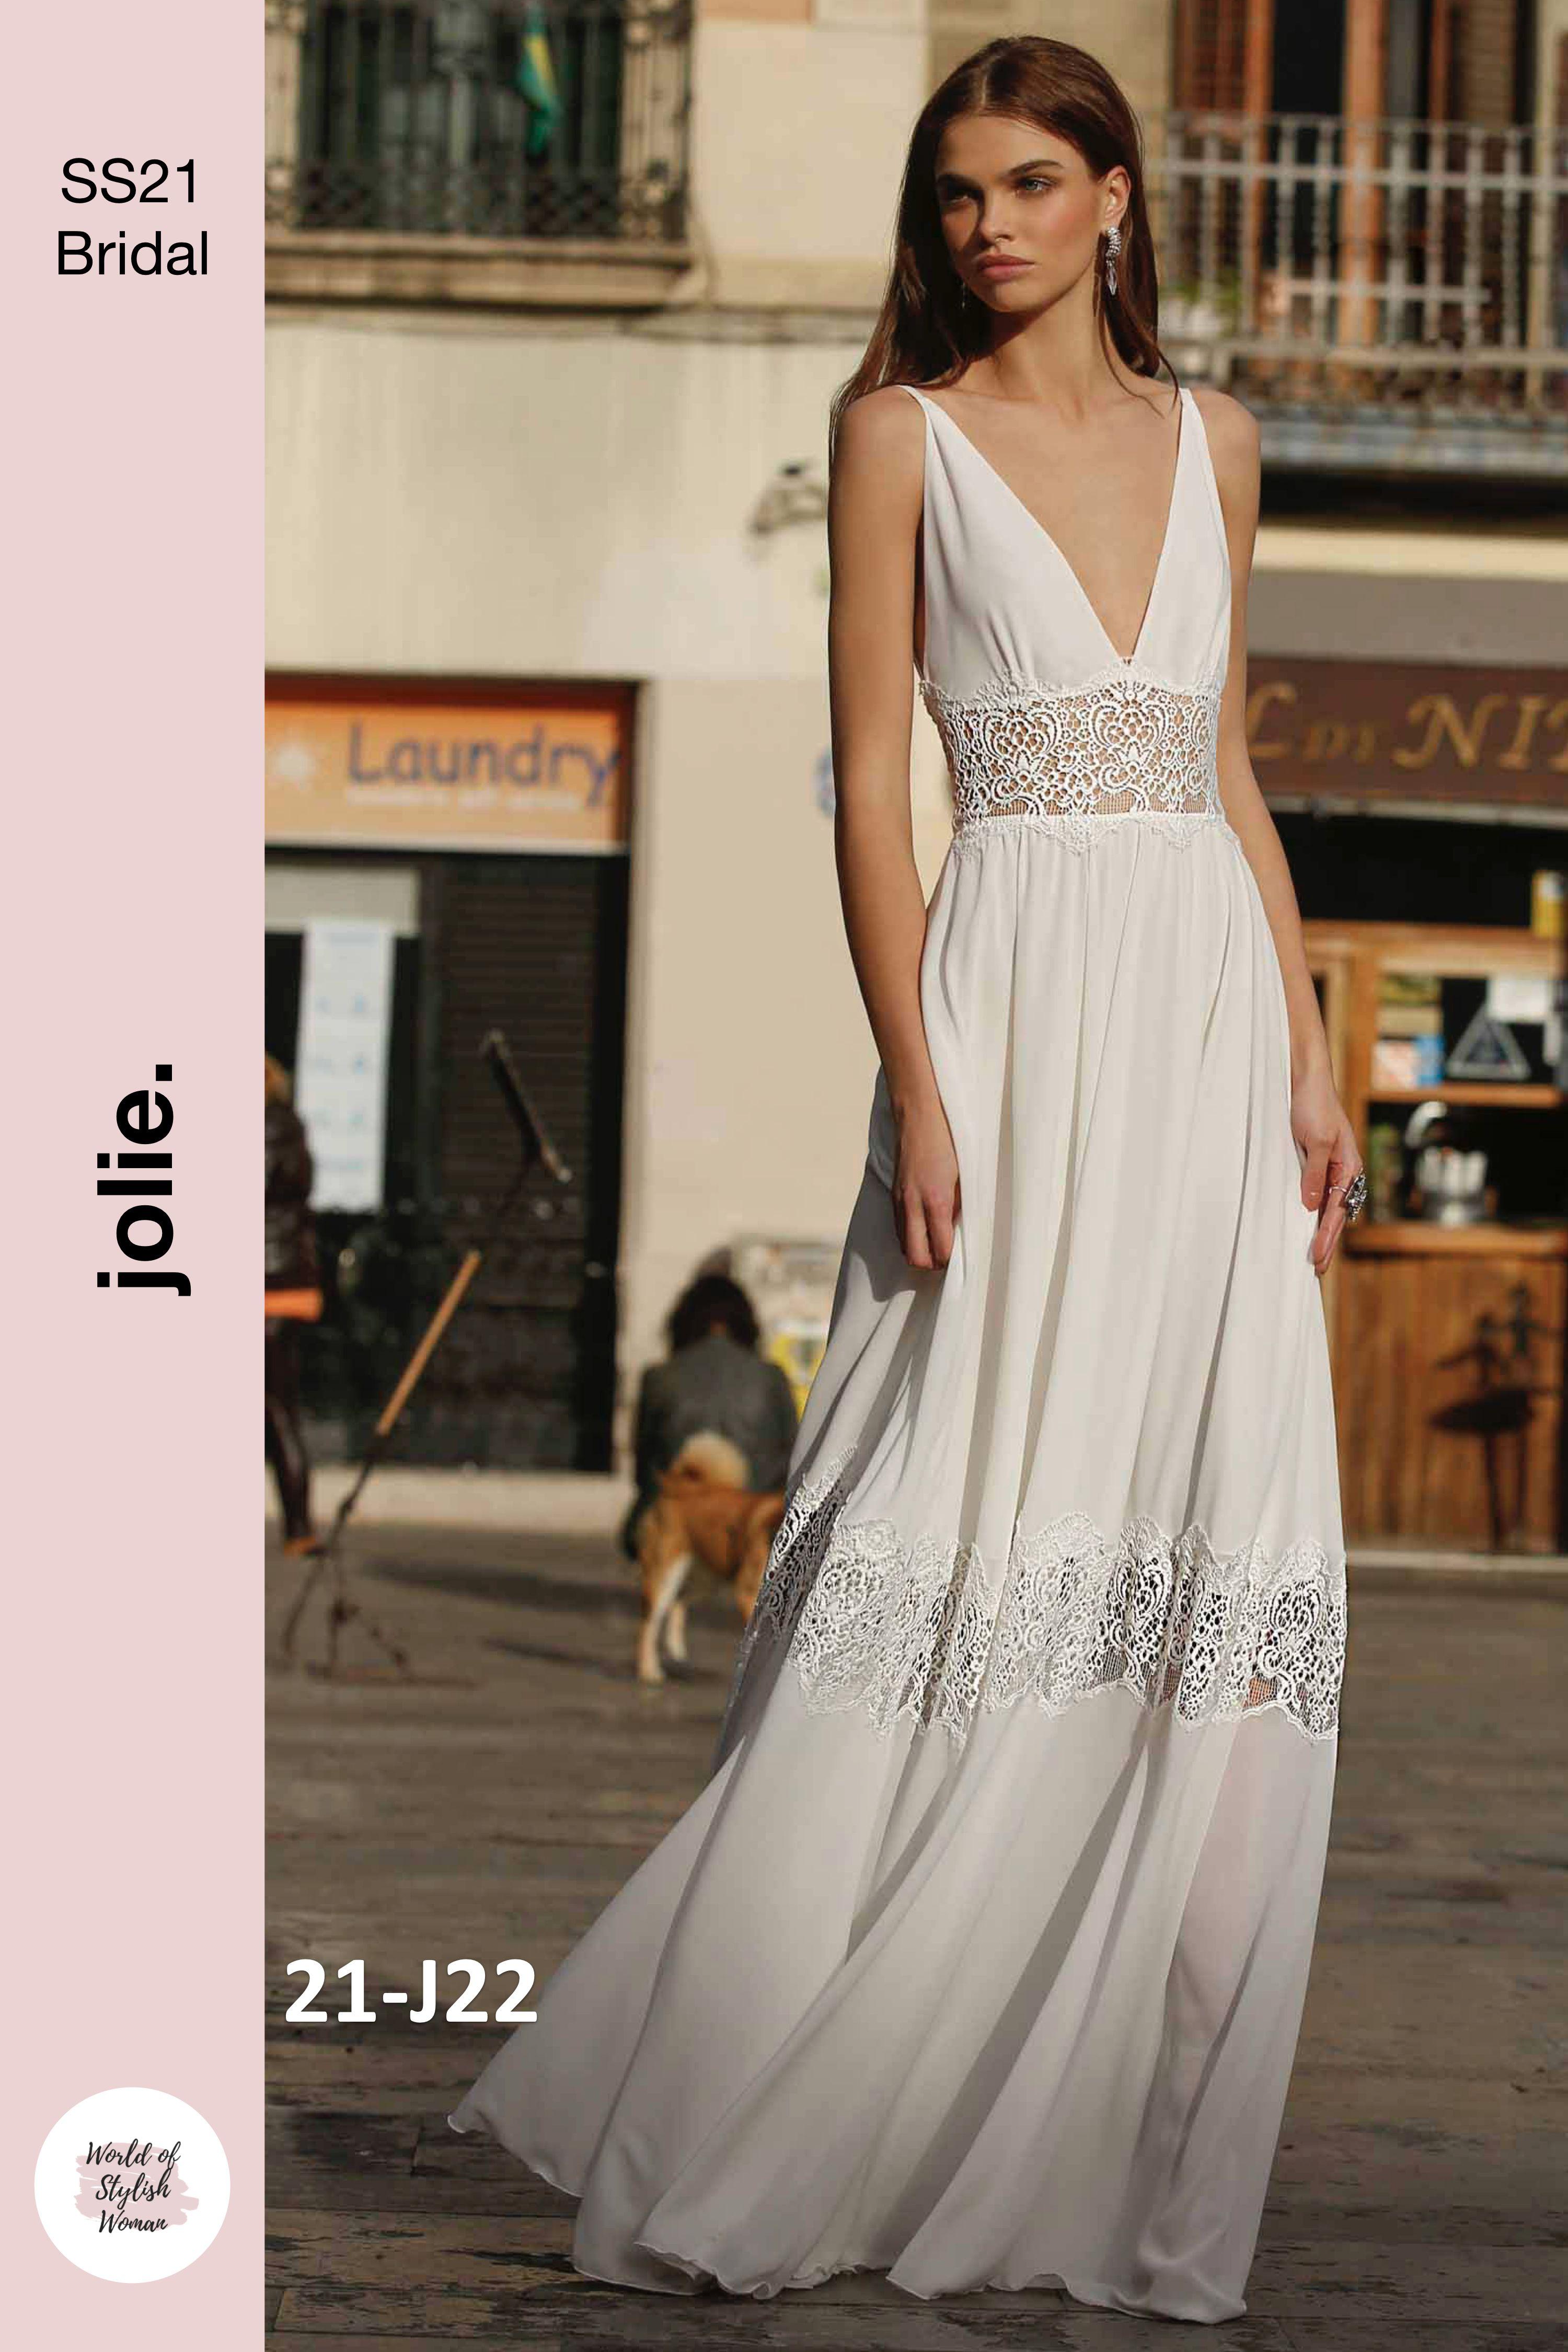 jolie. 21J22 Spring Summer 2021 Bridal Collection in